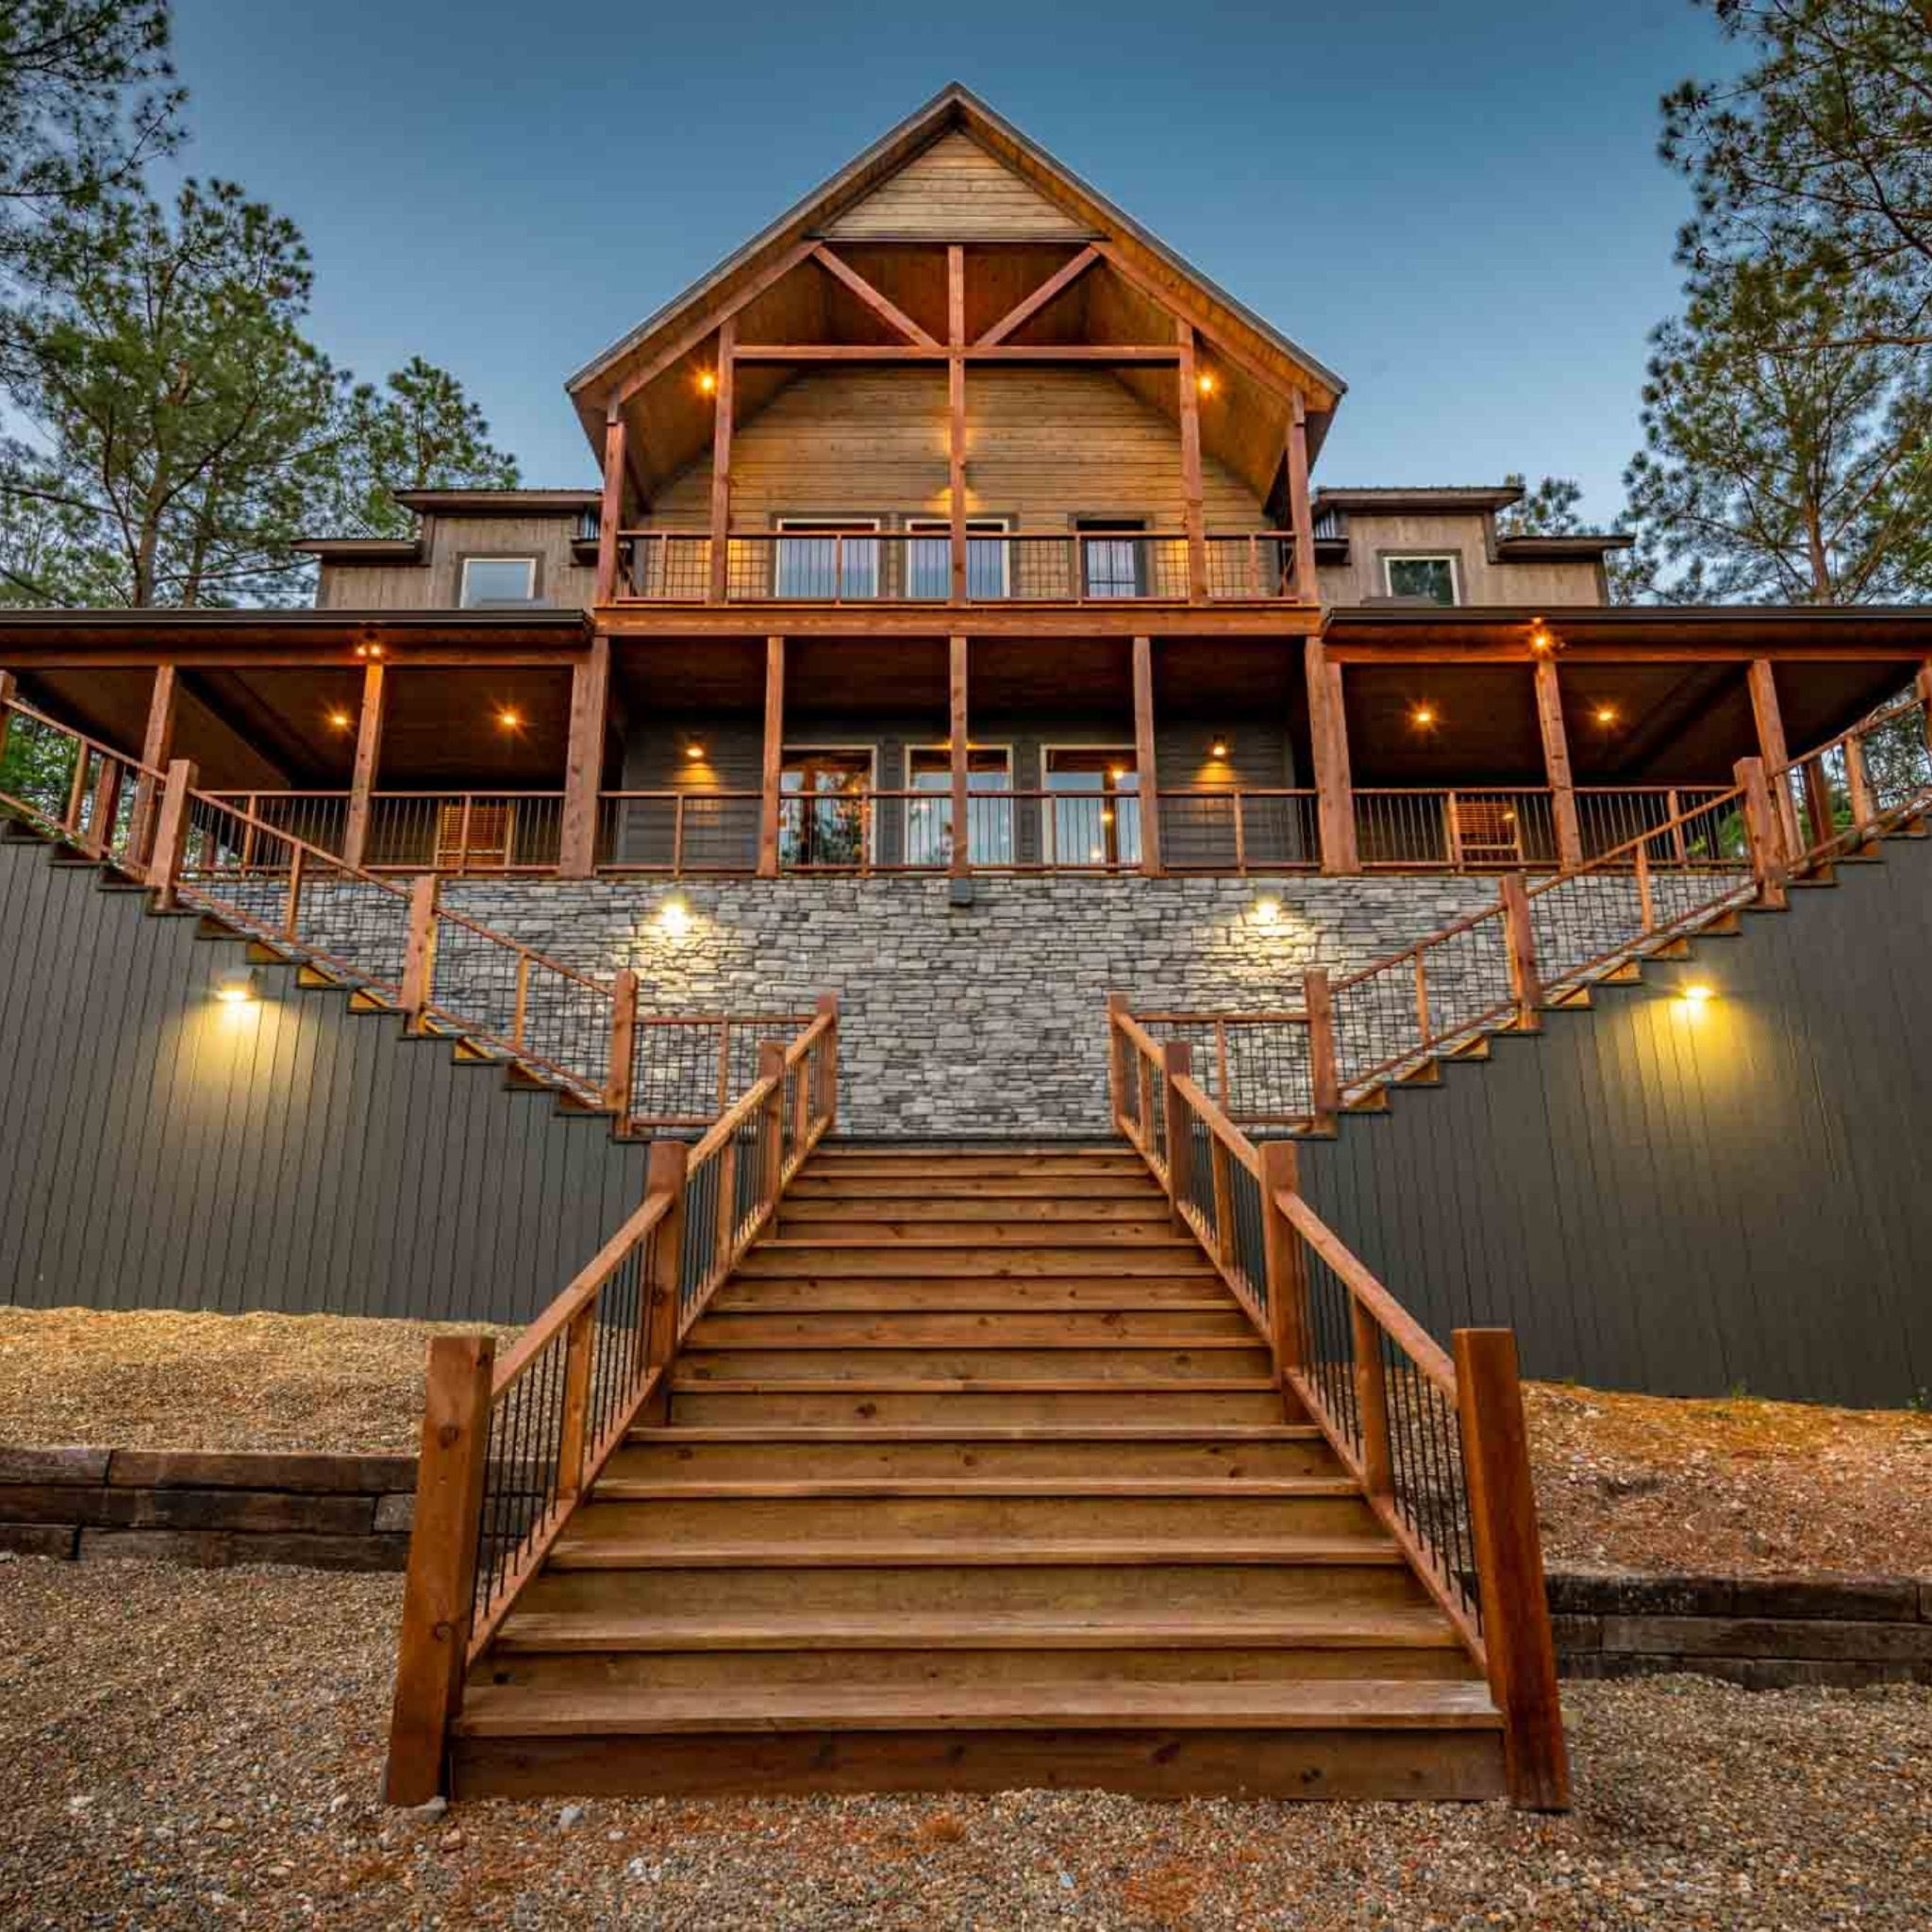 Grand Lux Cabin Luxury cabin, Cabin, Vacation cabin rentals